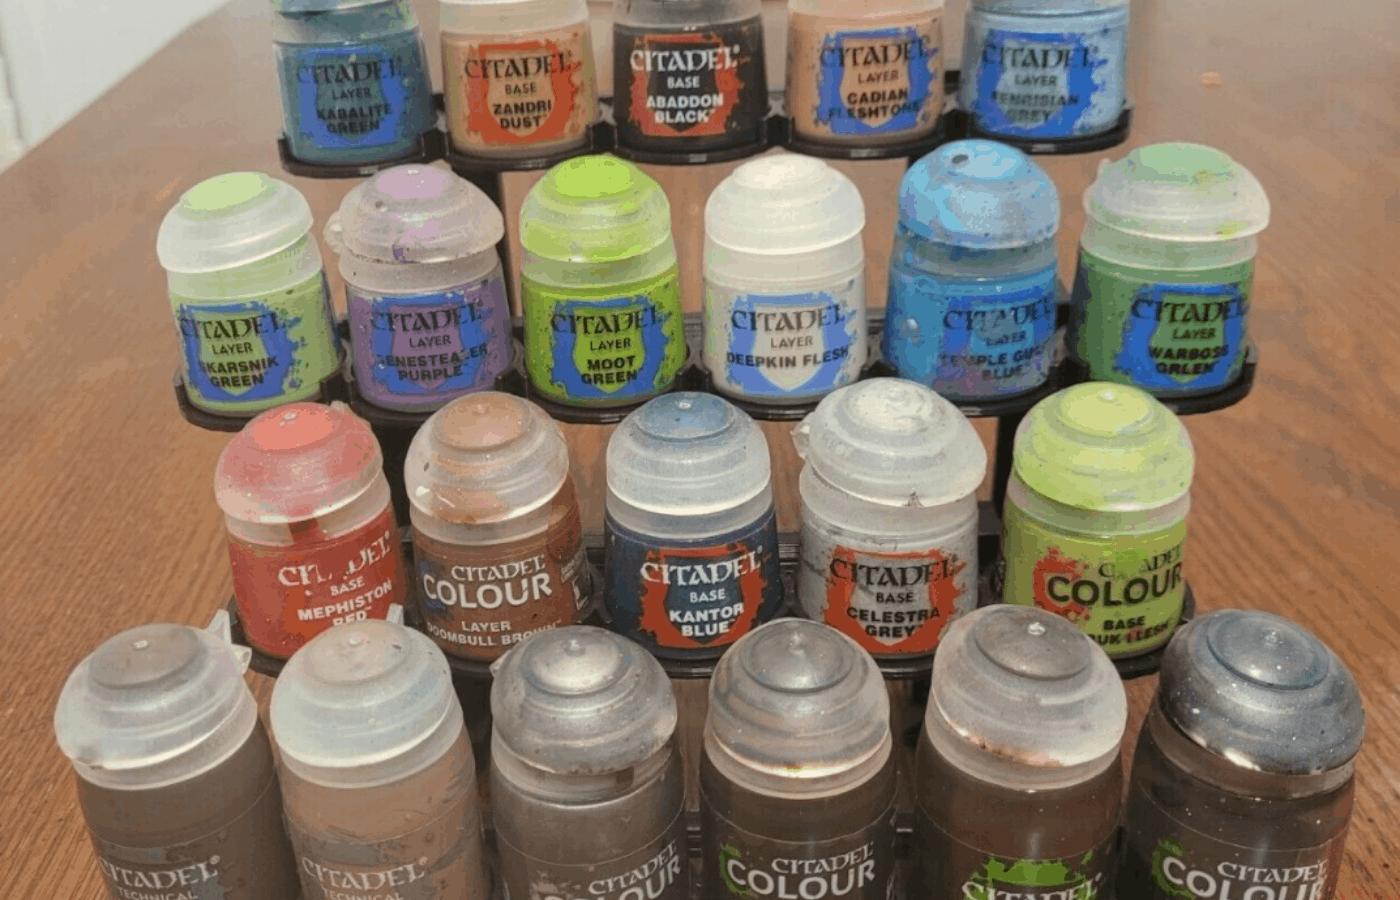 How to Clean Citadel Paint Pots